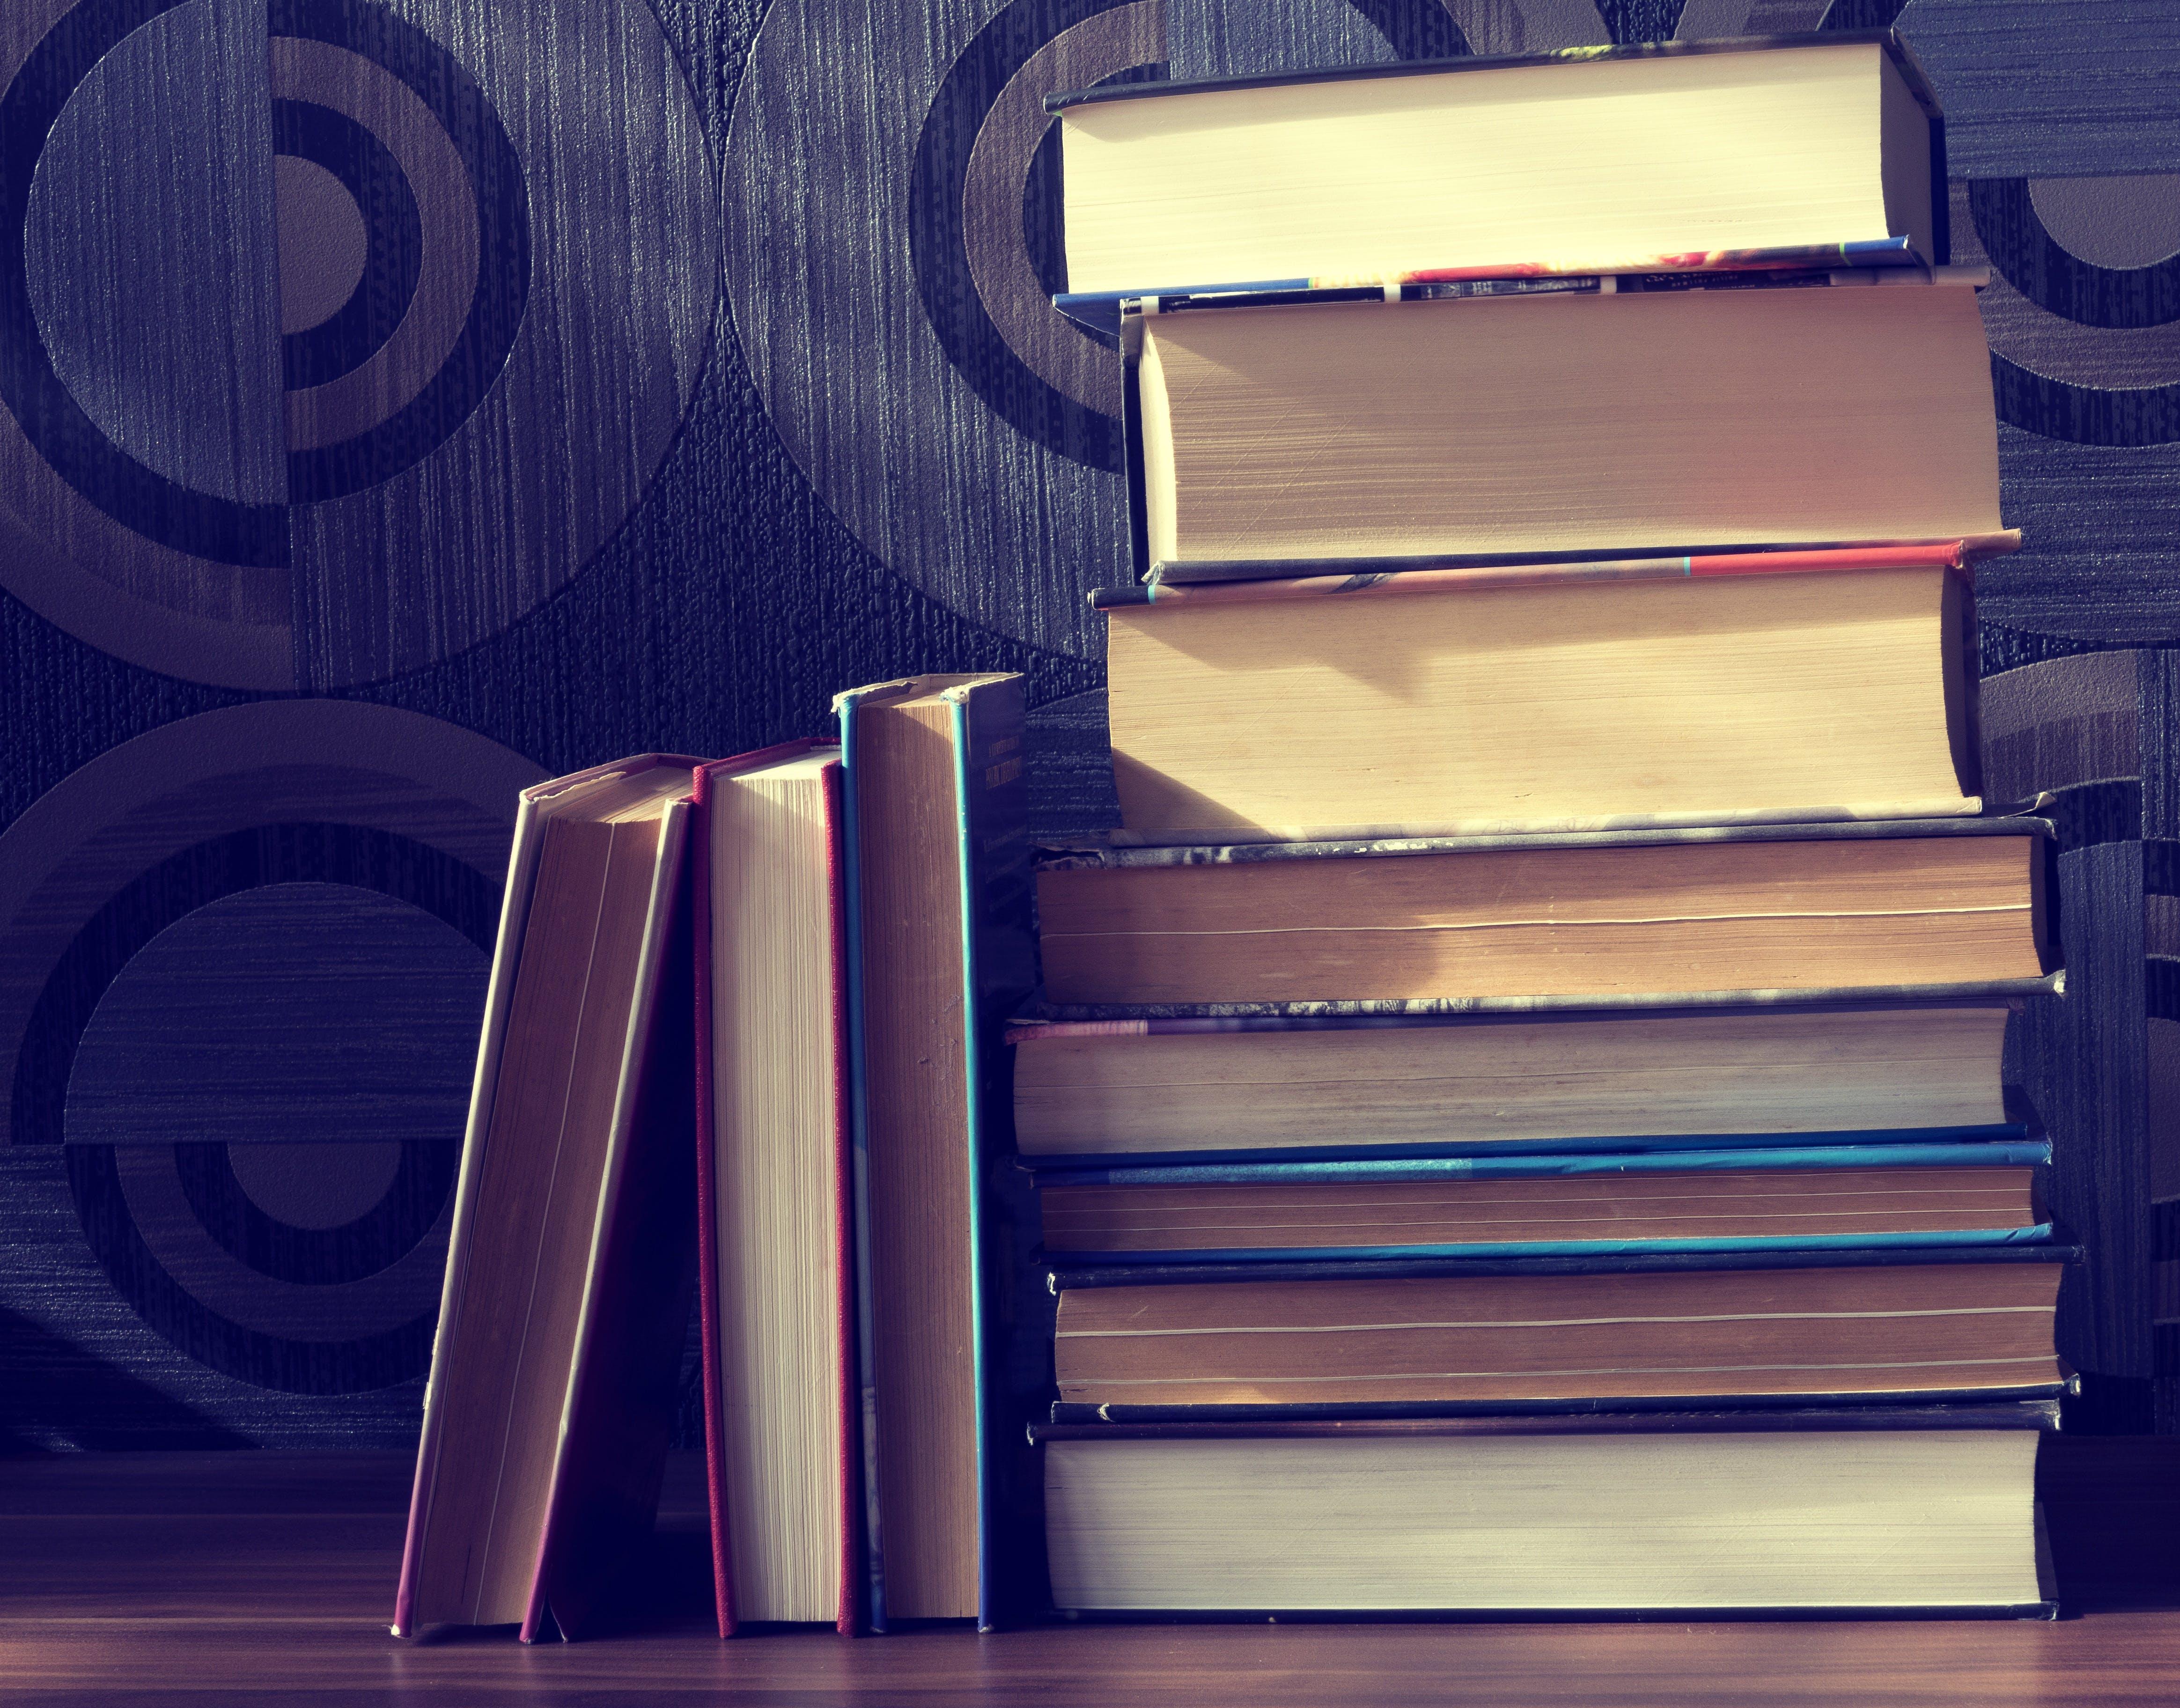 book stack, books, classic